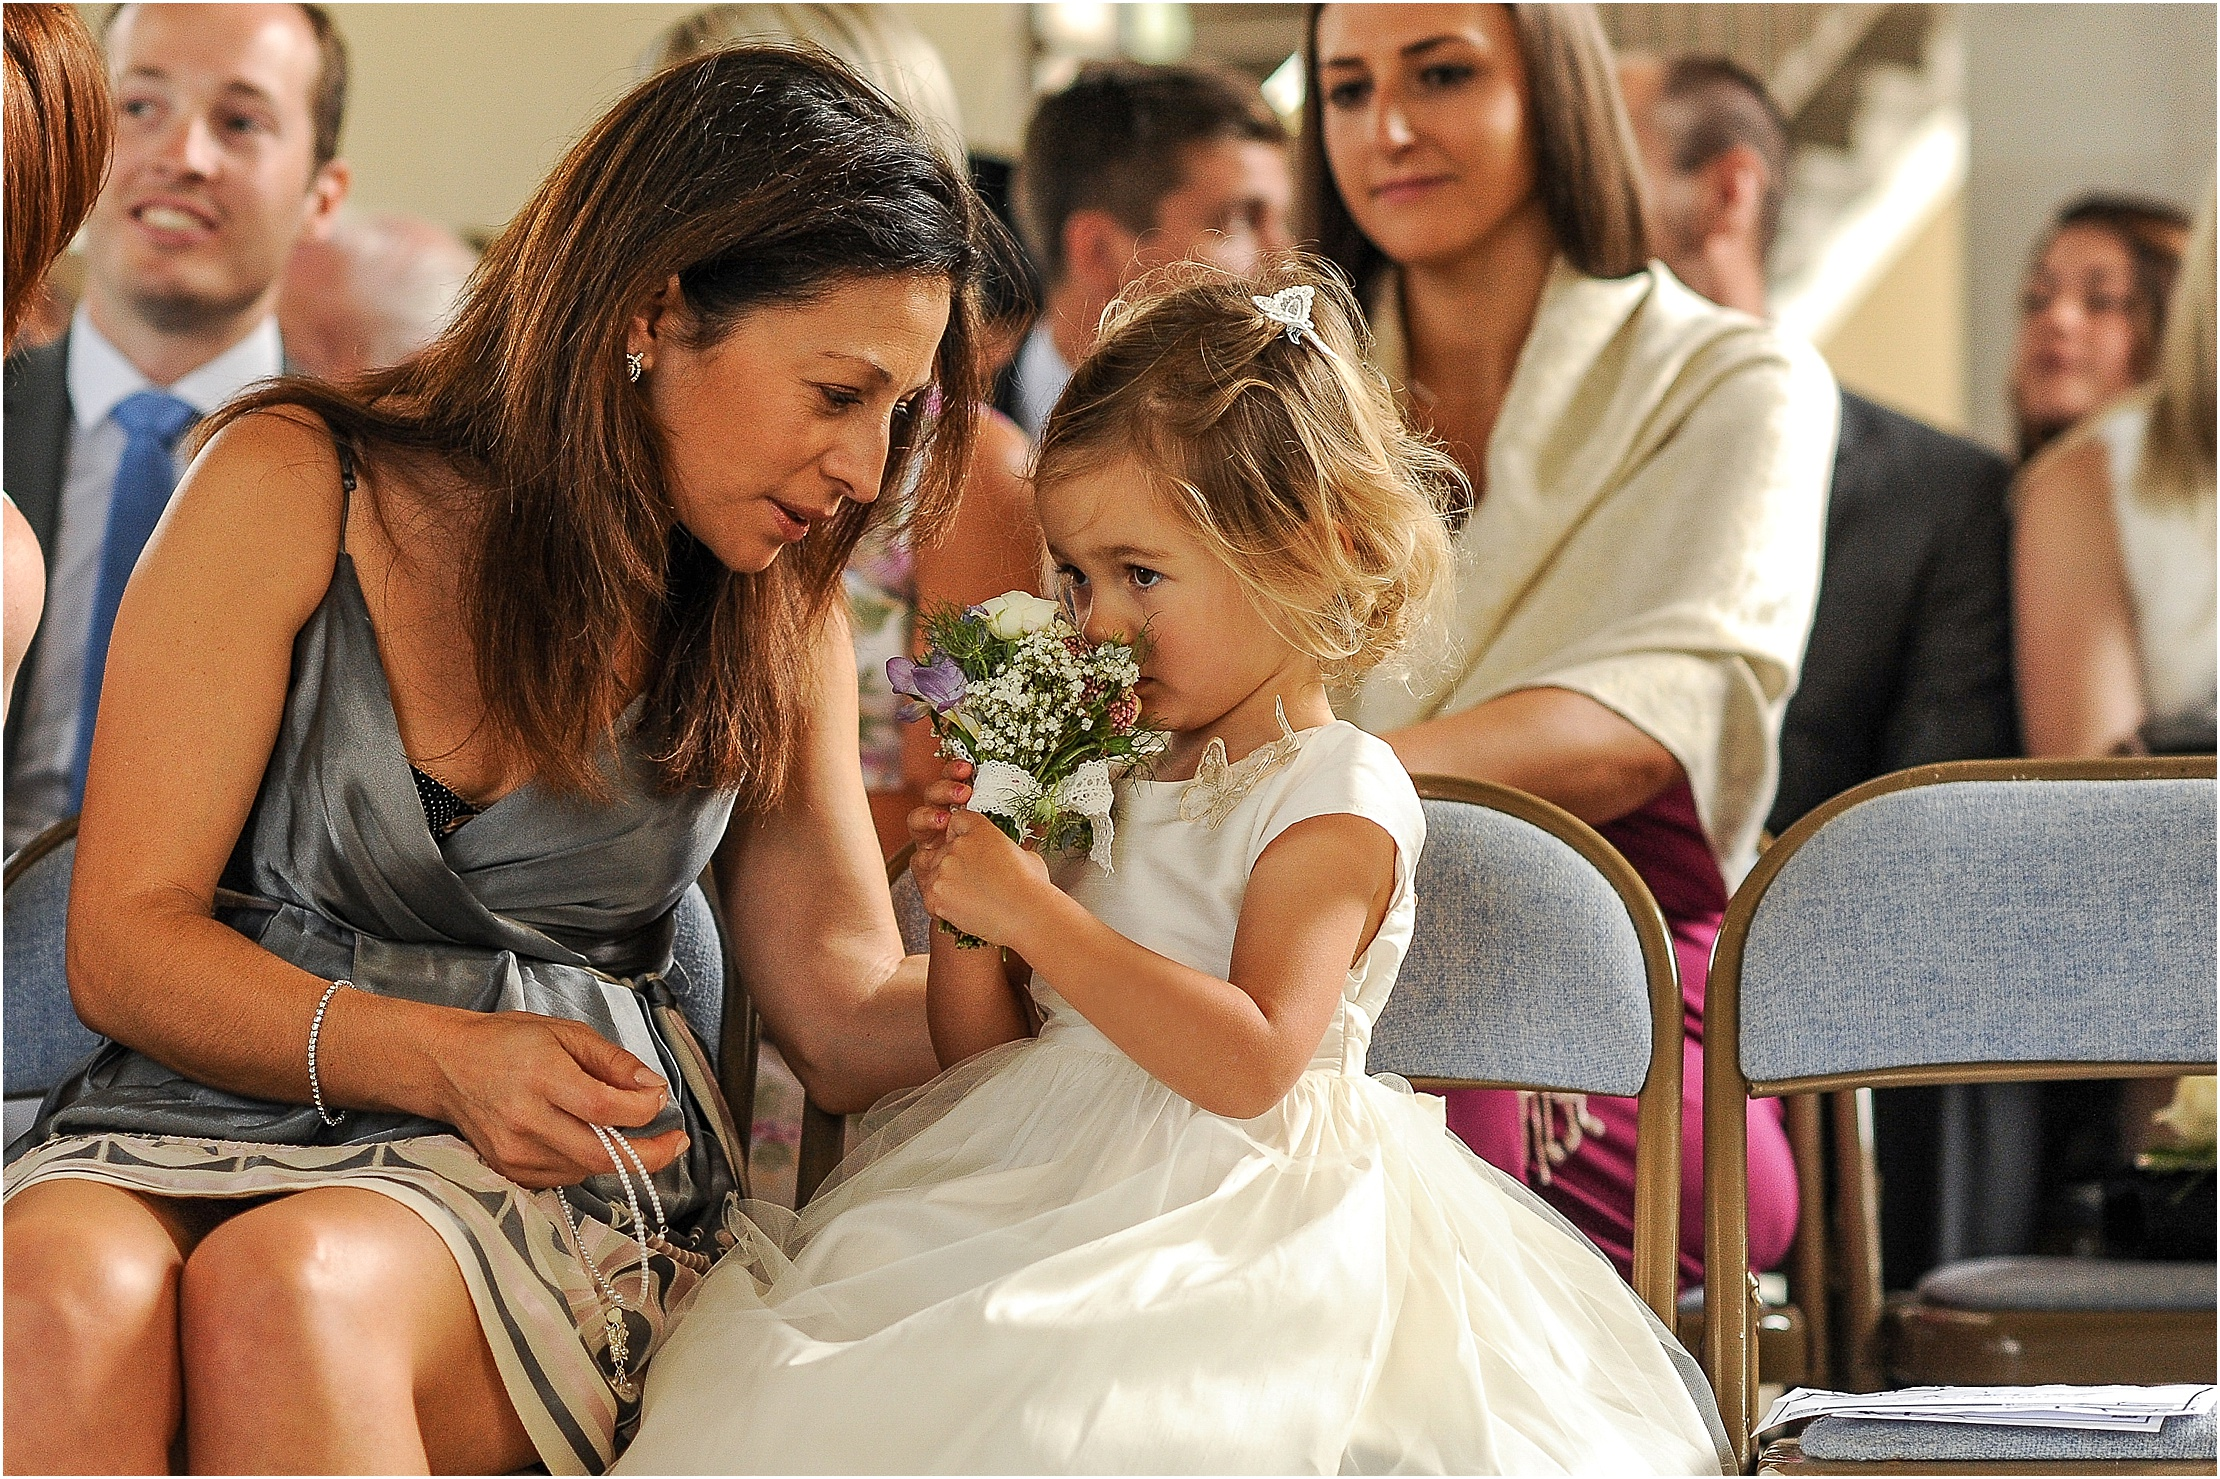 staining-lodge-wedding-049.jpg